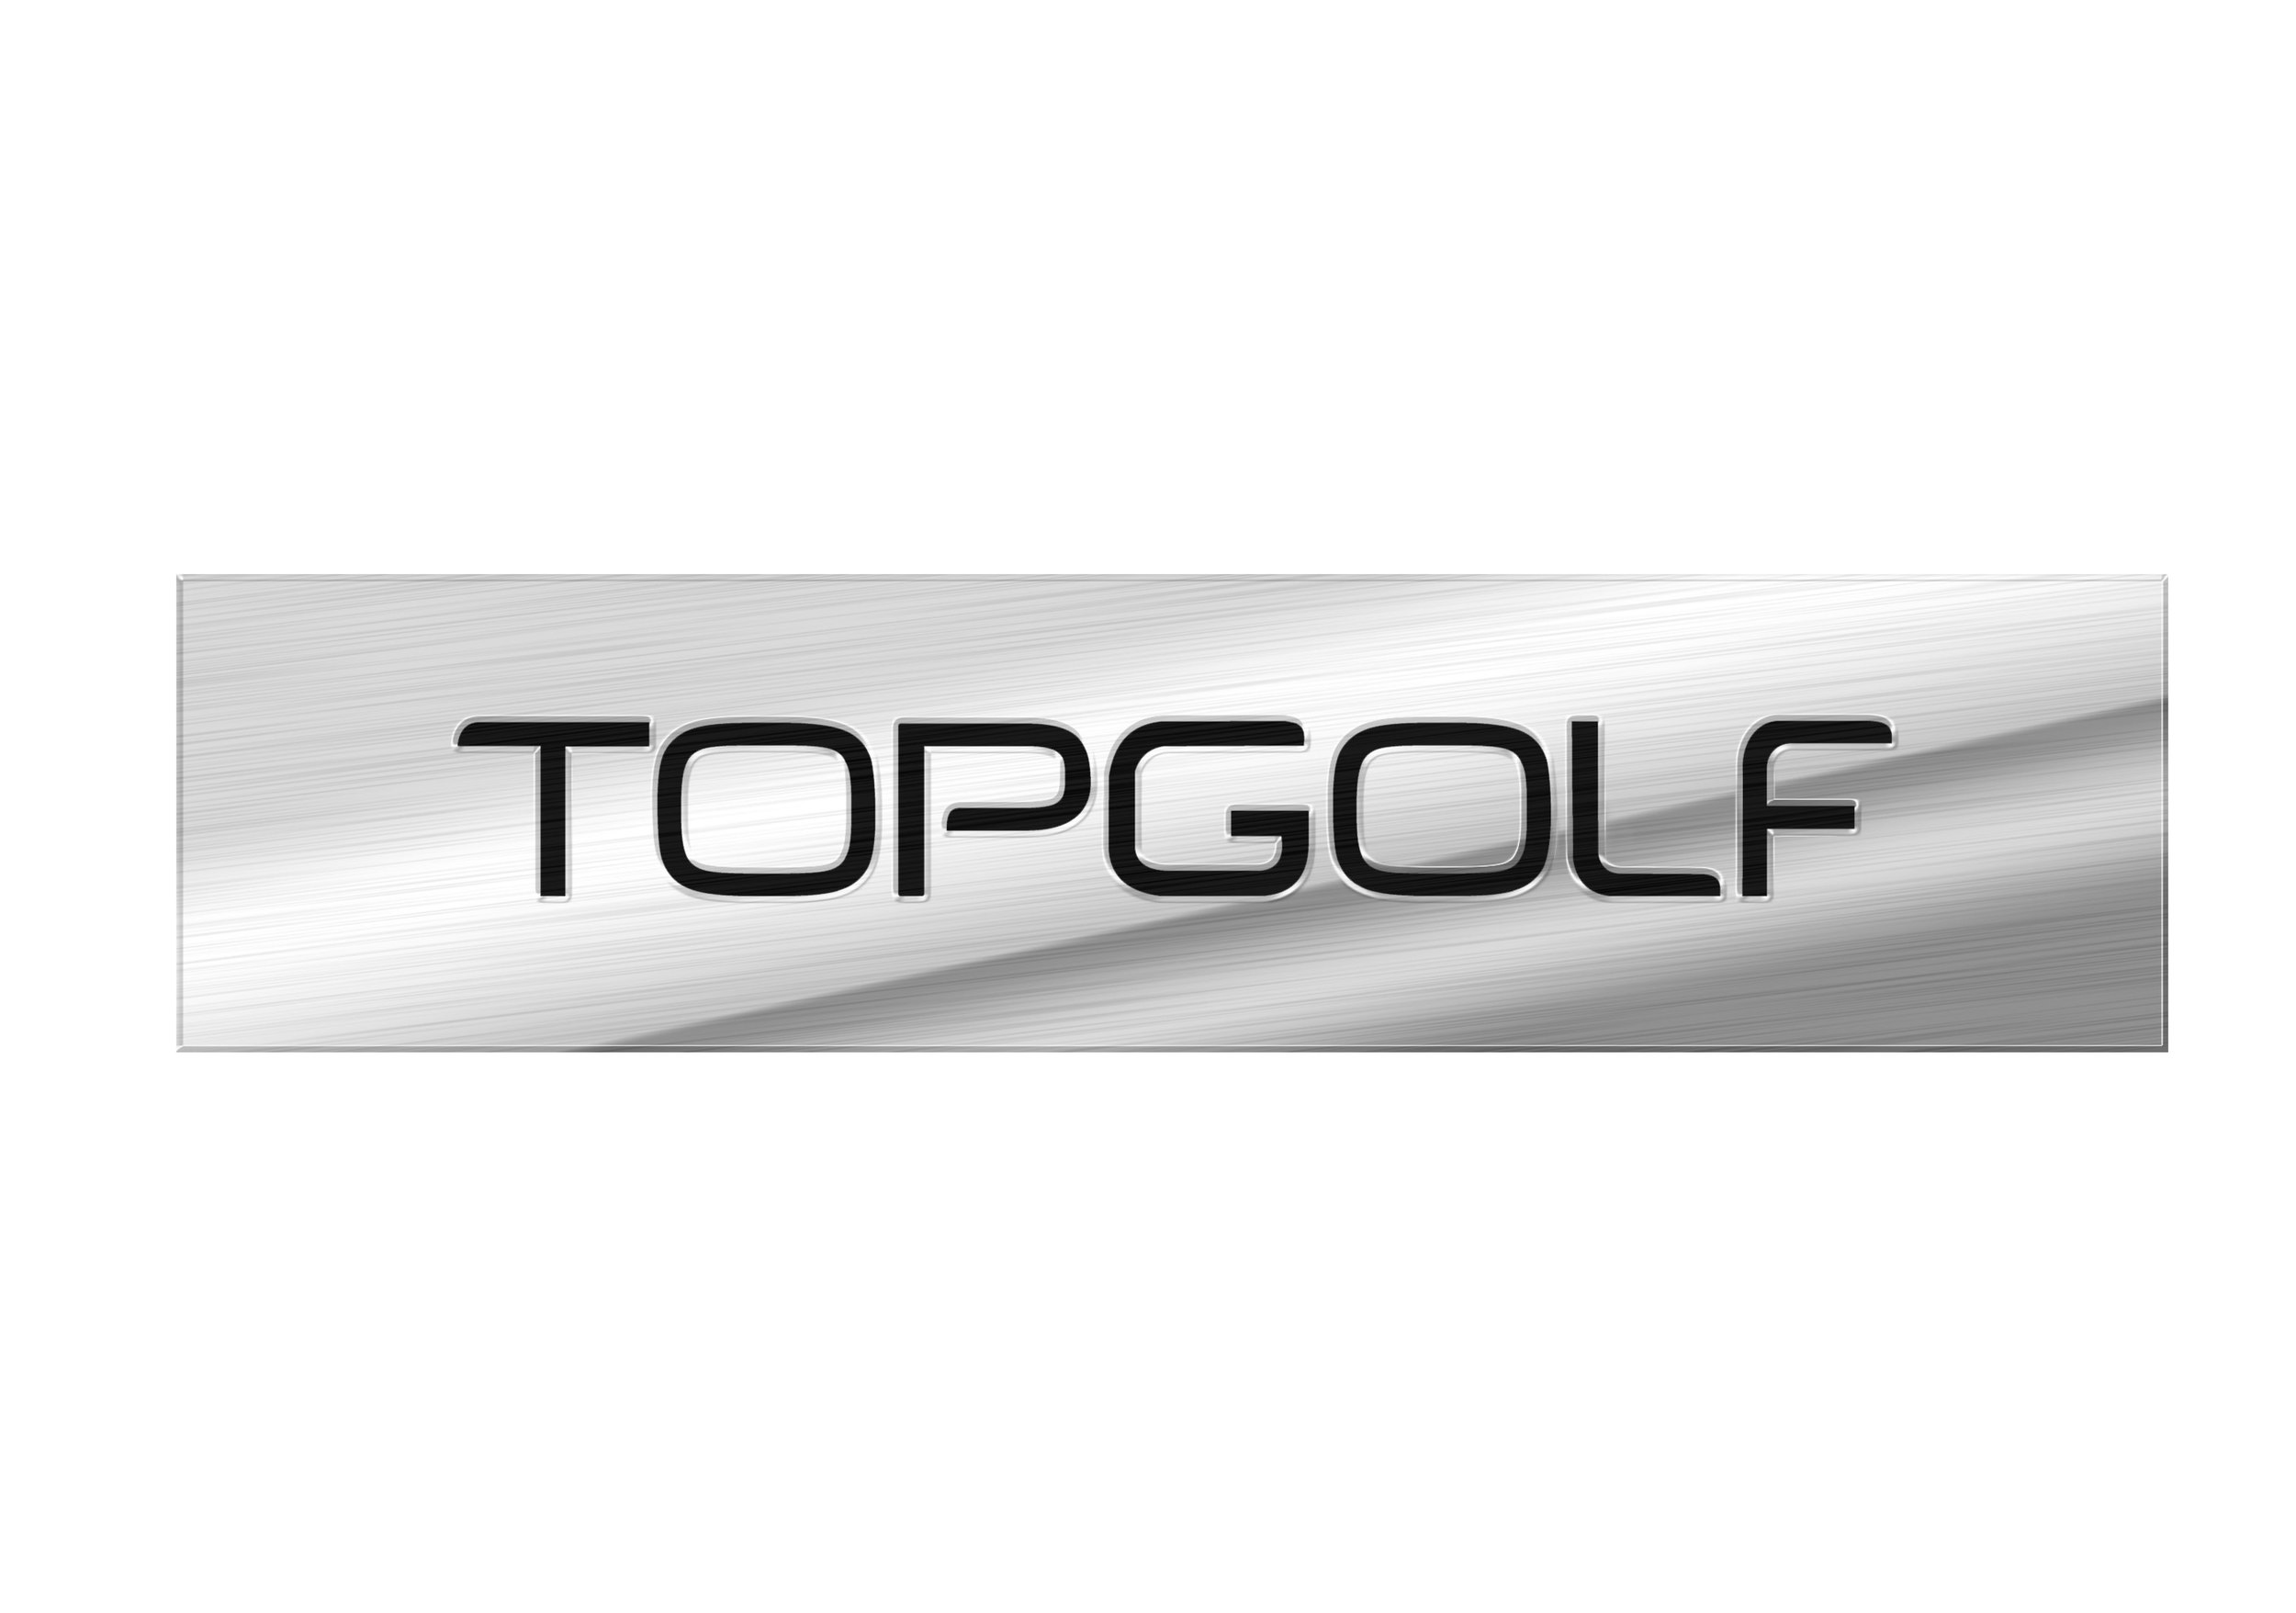 TOPGOLF-2.jpg